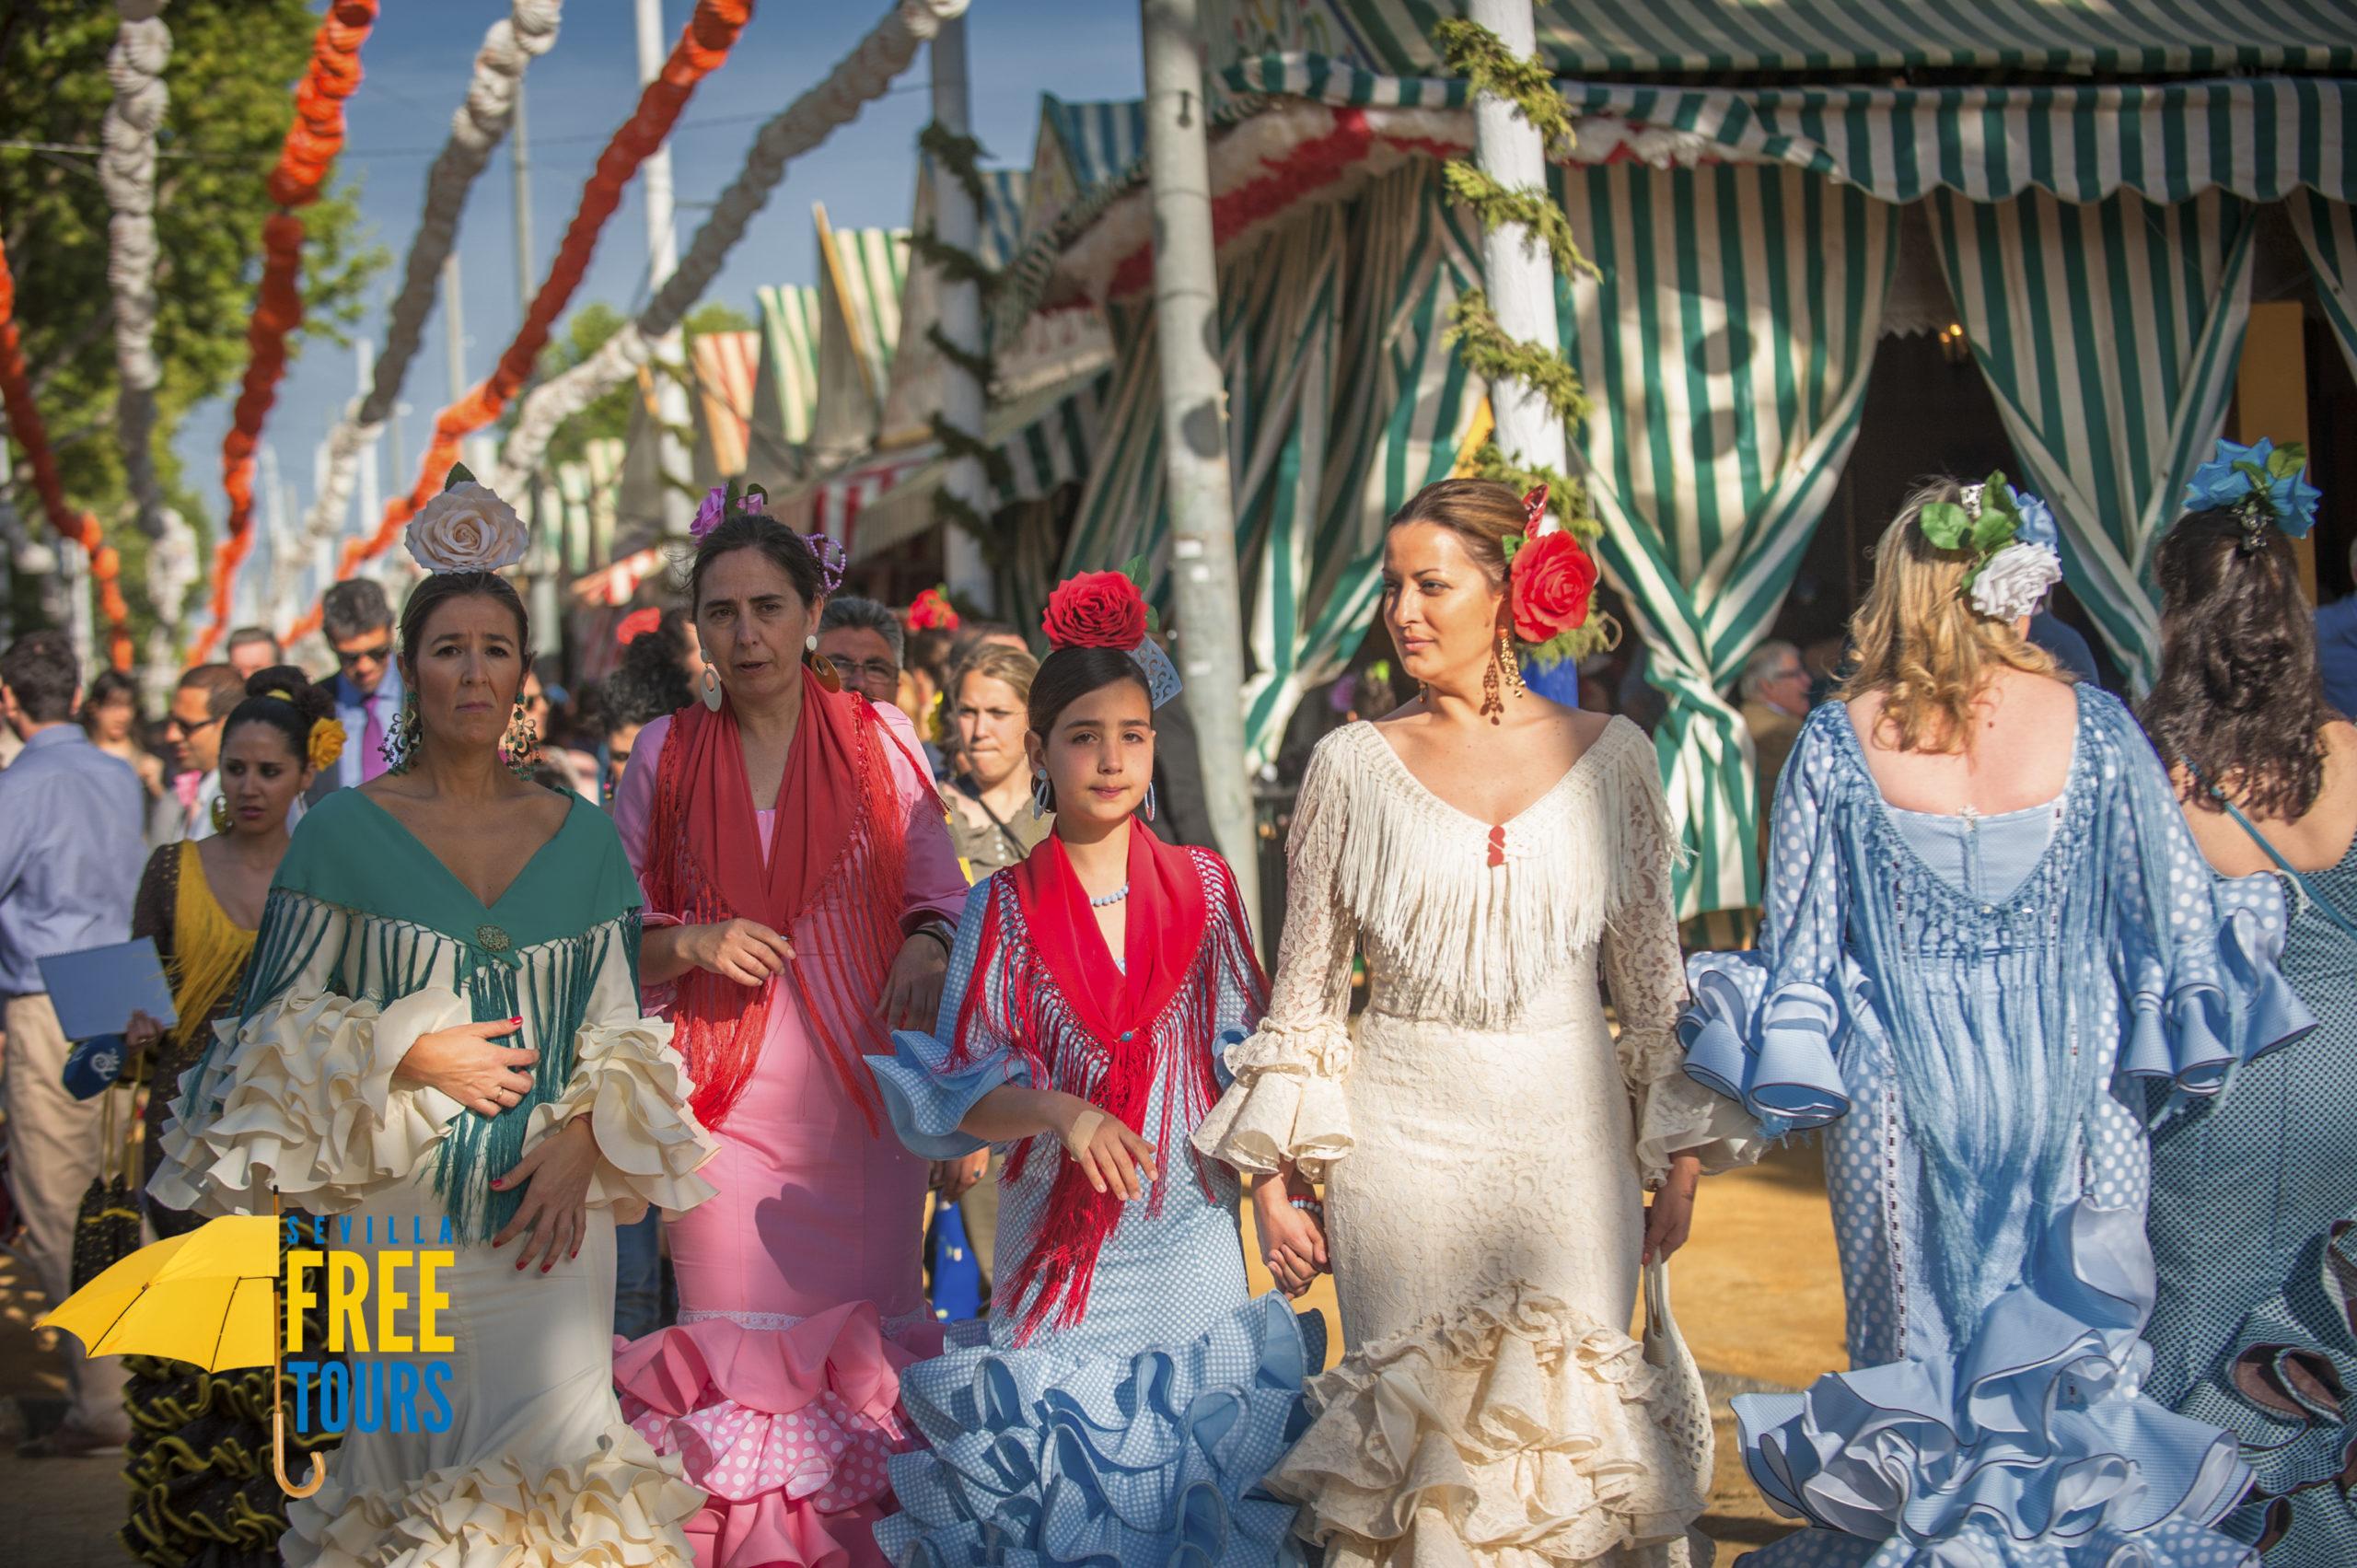 Donde ver Flamenco gratis en Sevilla